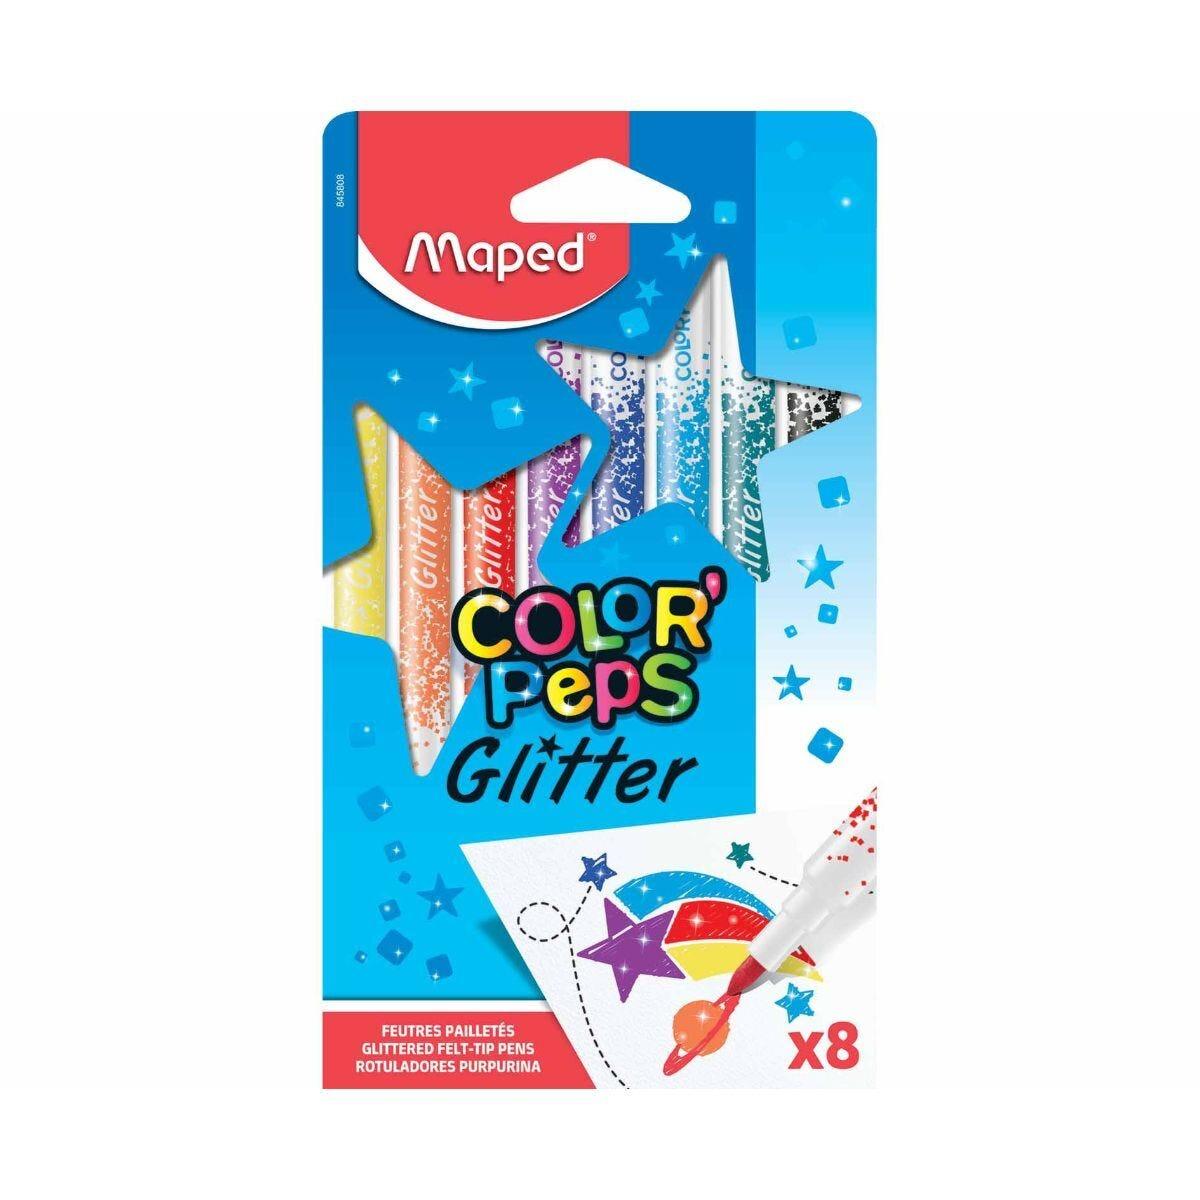 Maped Color Peps Glitter Felt Tip Colouring Pens Pack of 8